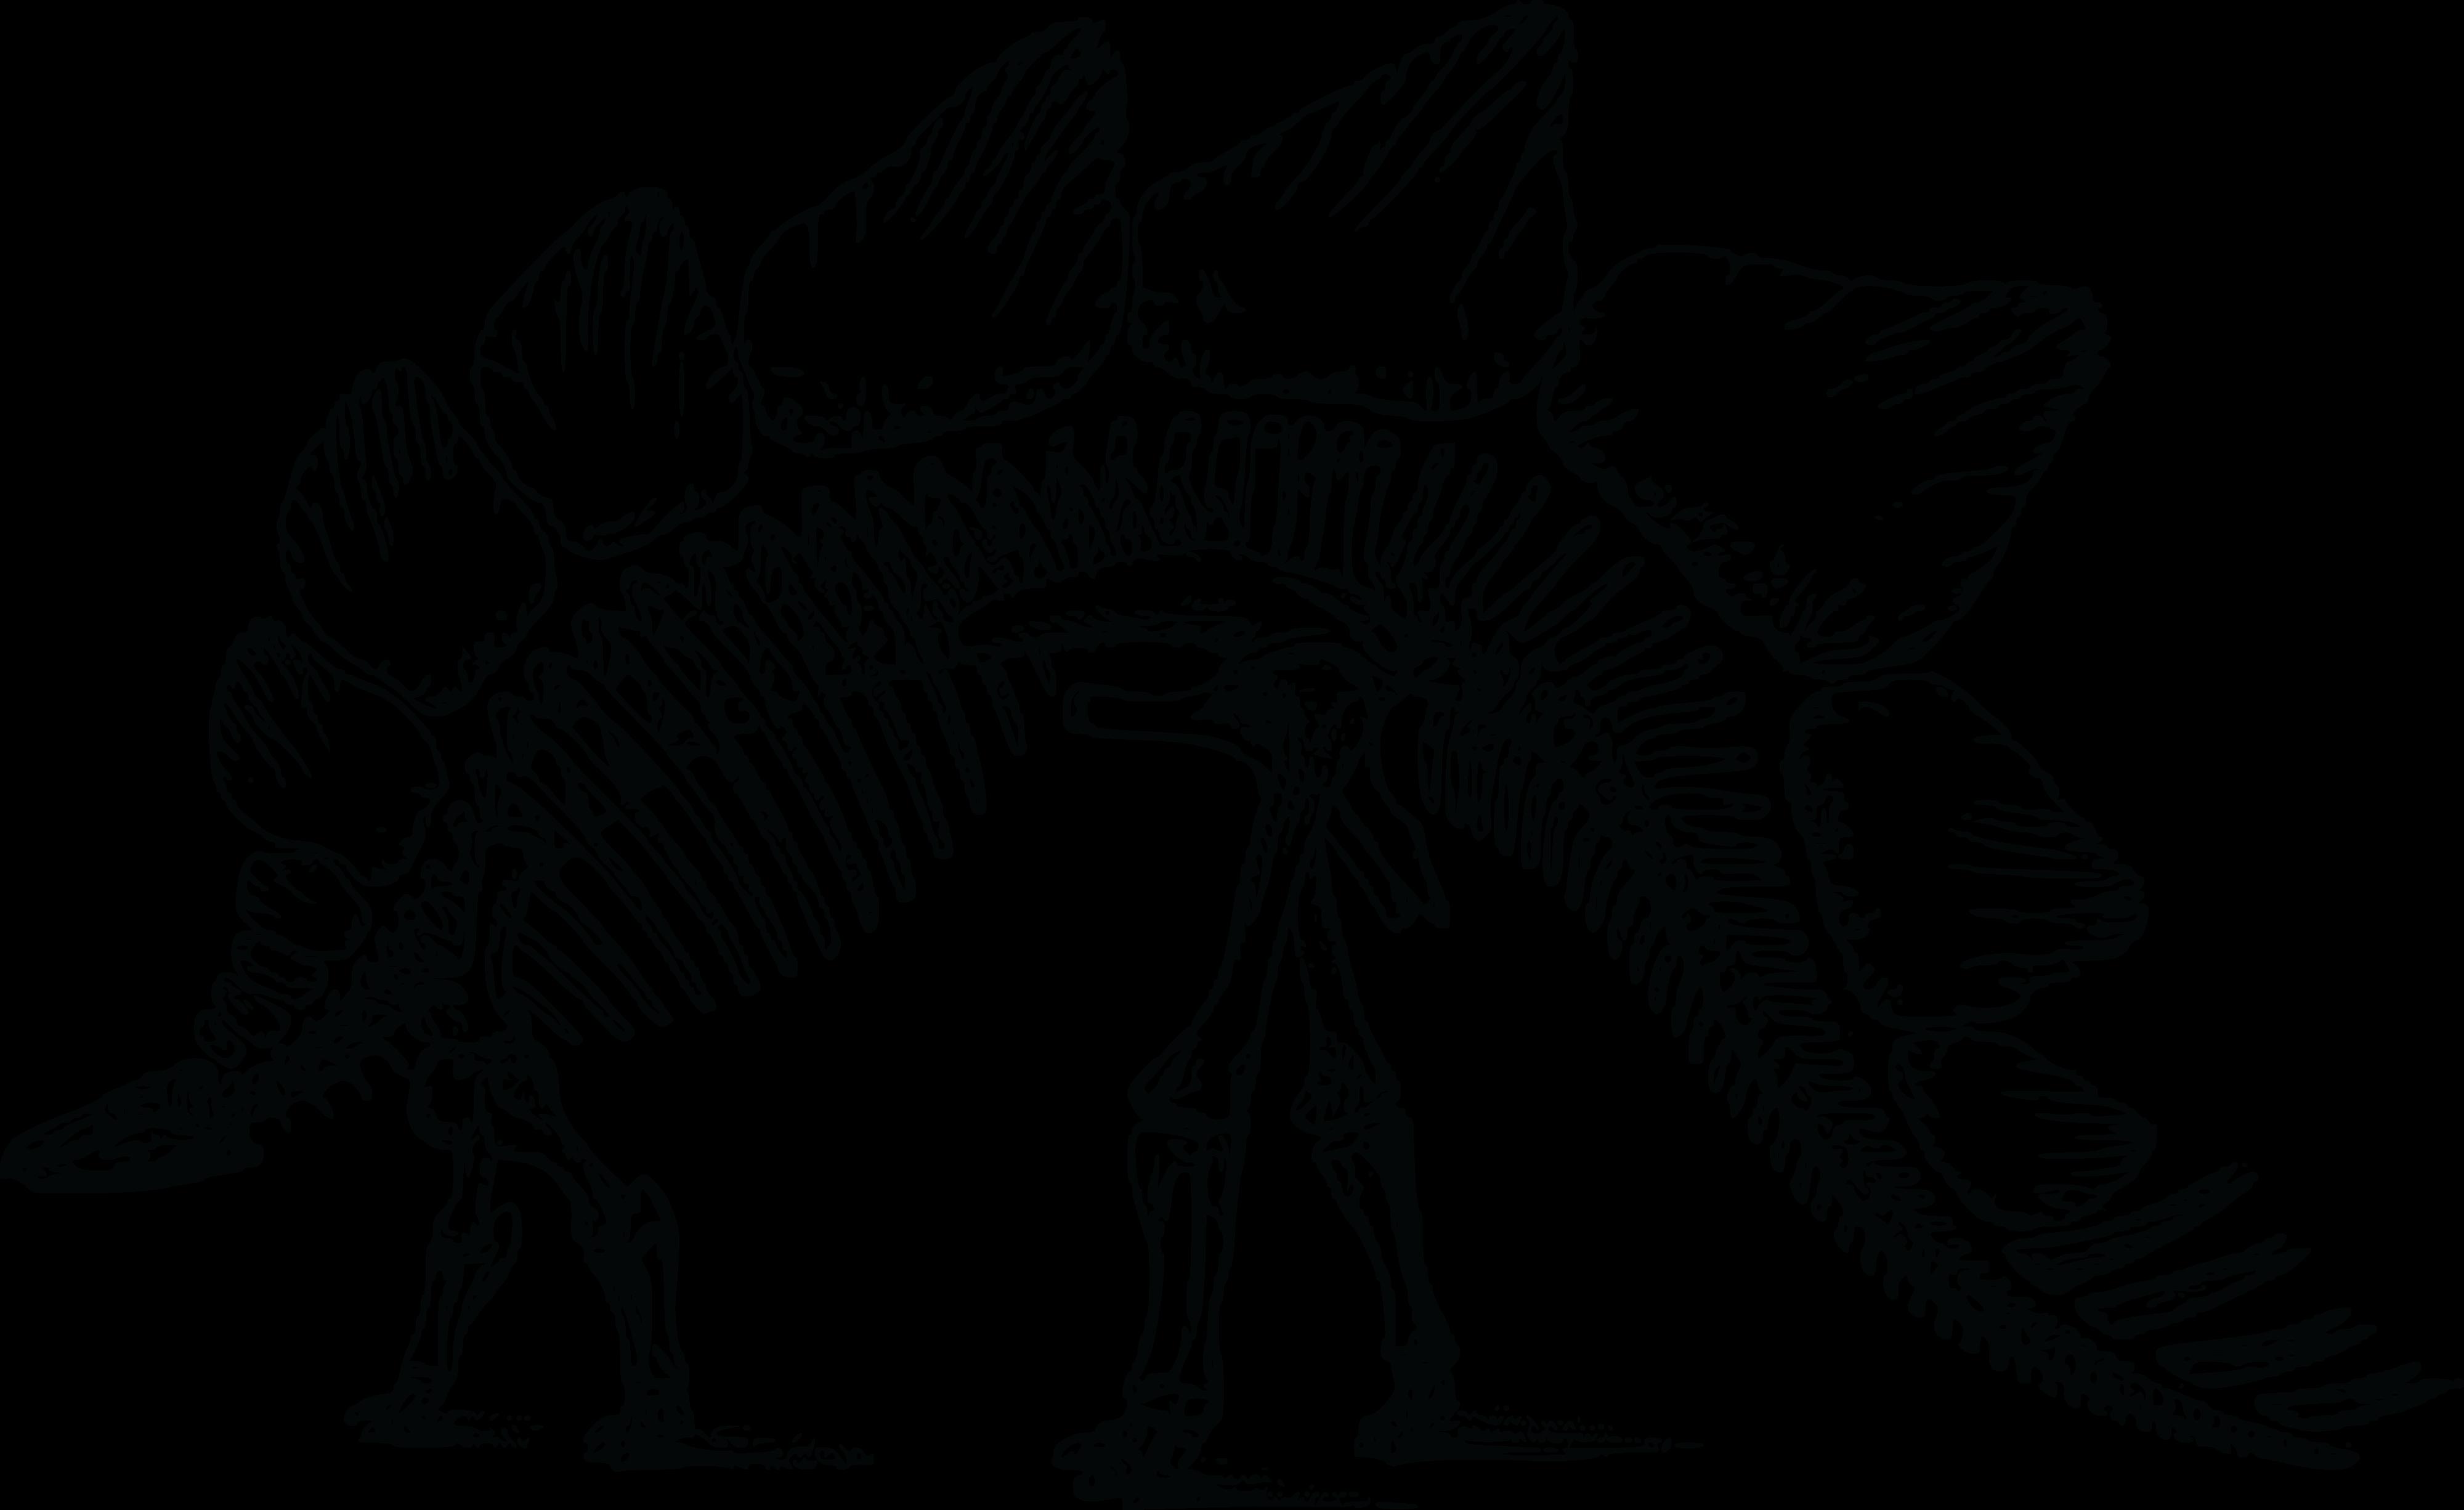 Stegosaurus skeleton silhouette clipart vector freeuse download Stegosaurus Bone Wars Triceratops Skeleton - Skeleton png ... vector freeuse download